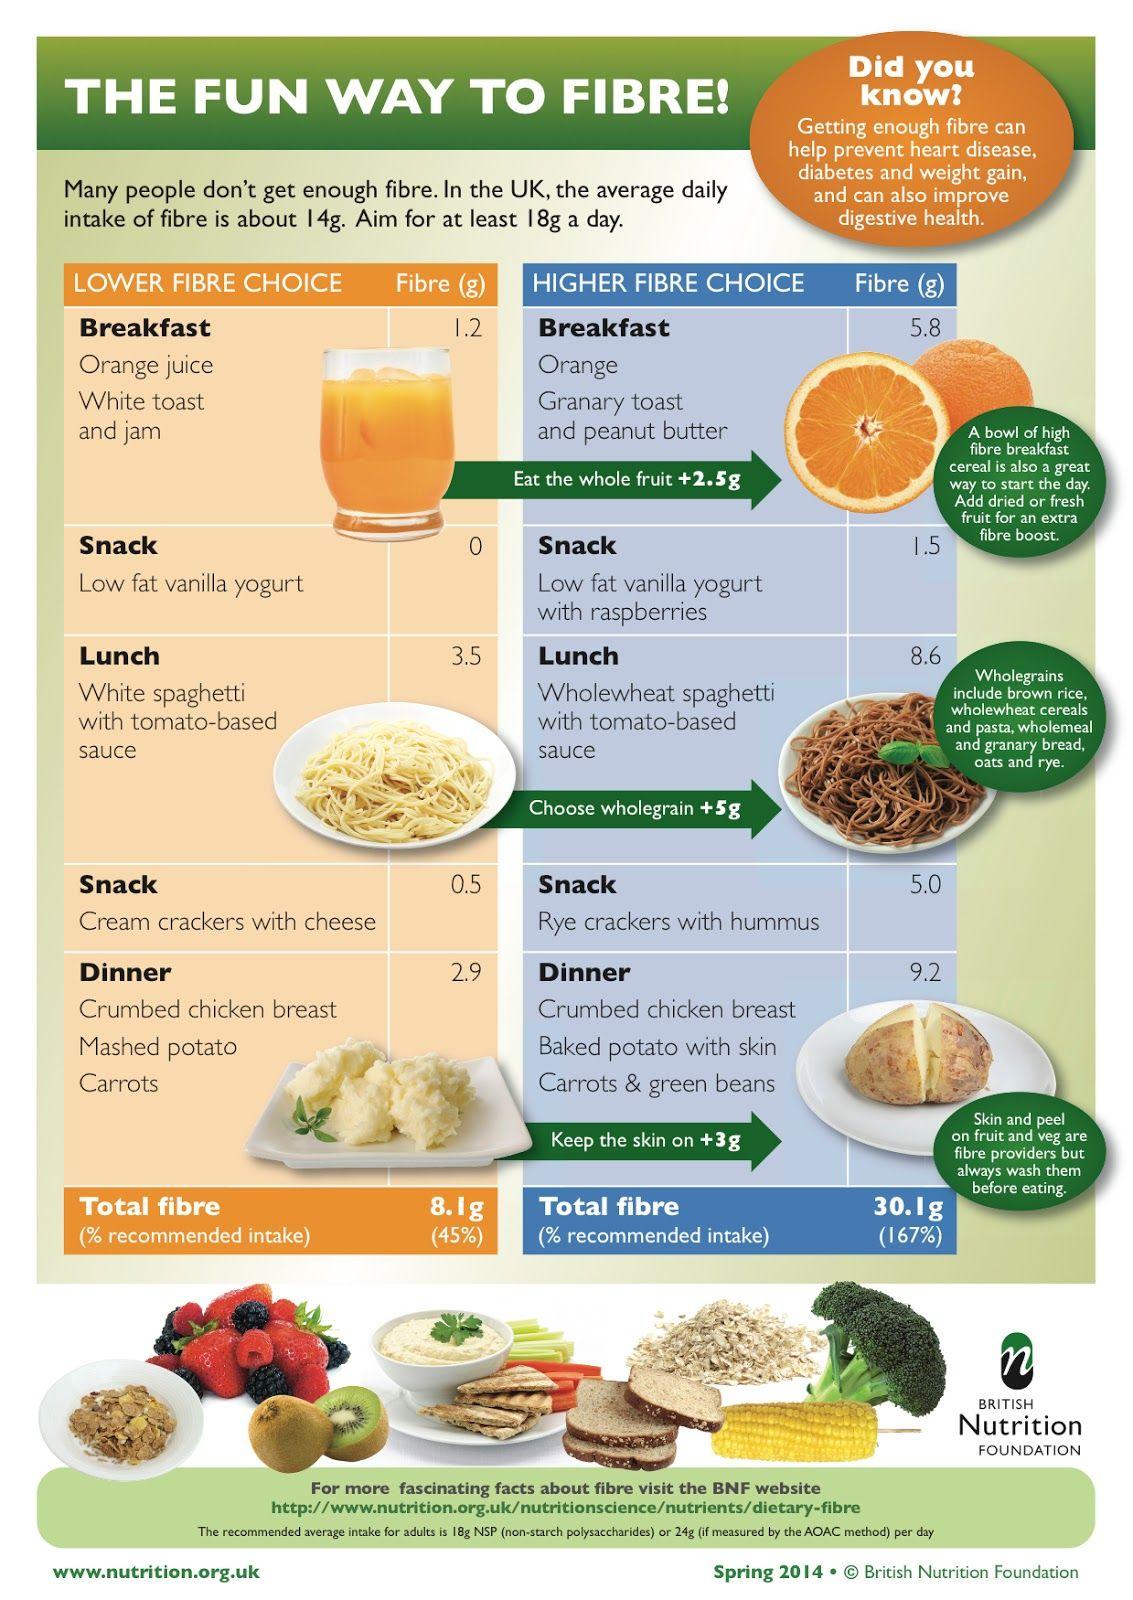 does dieting help decrease health problems